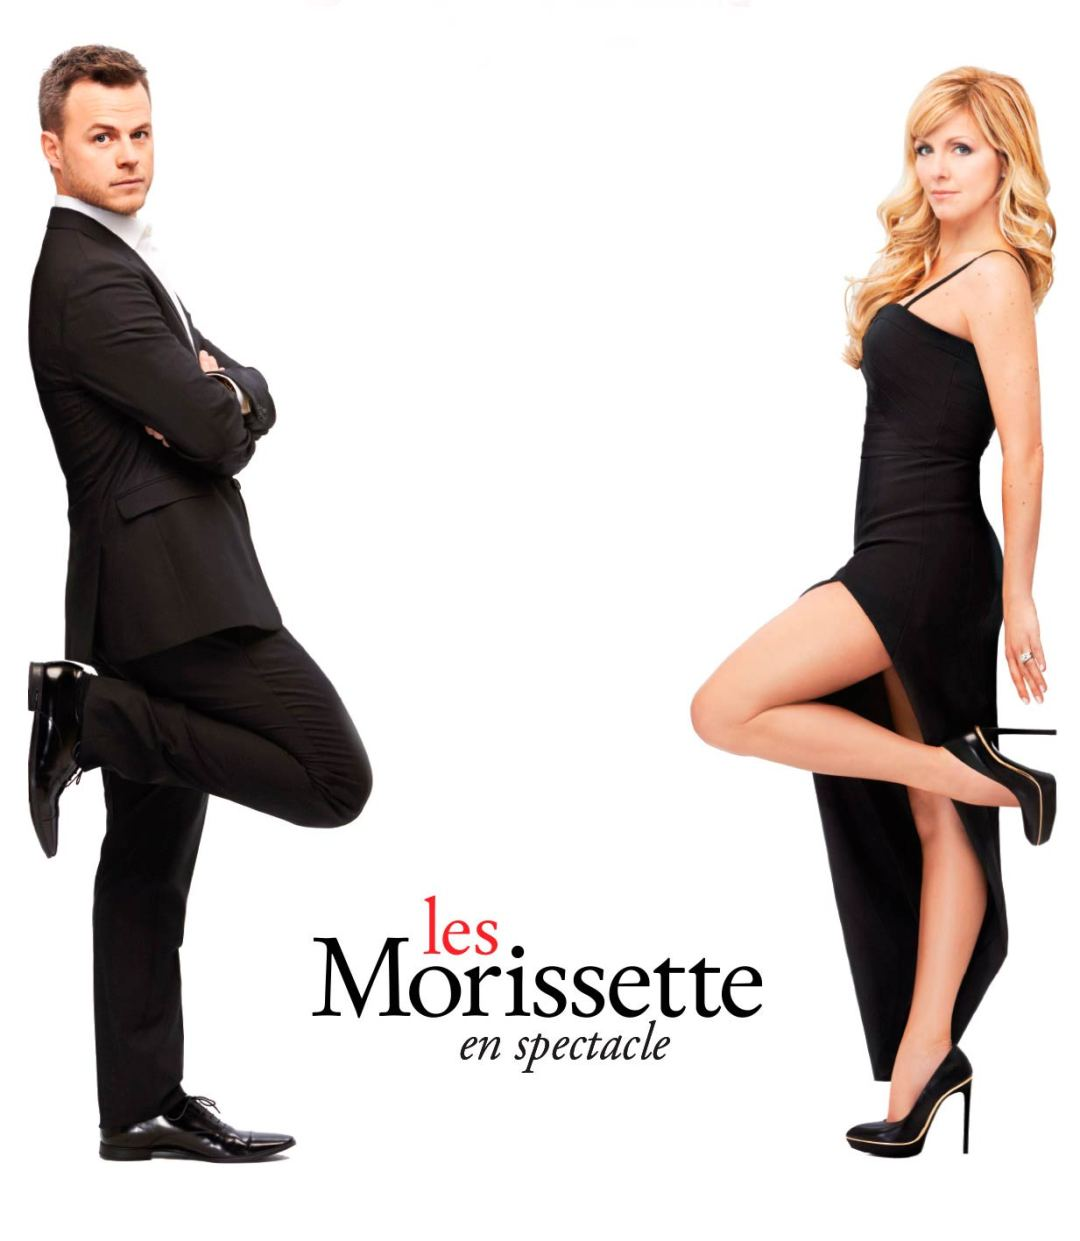 Les Morissette 2013 par Ariane Simard